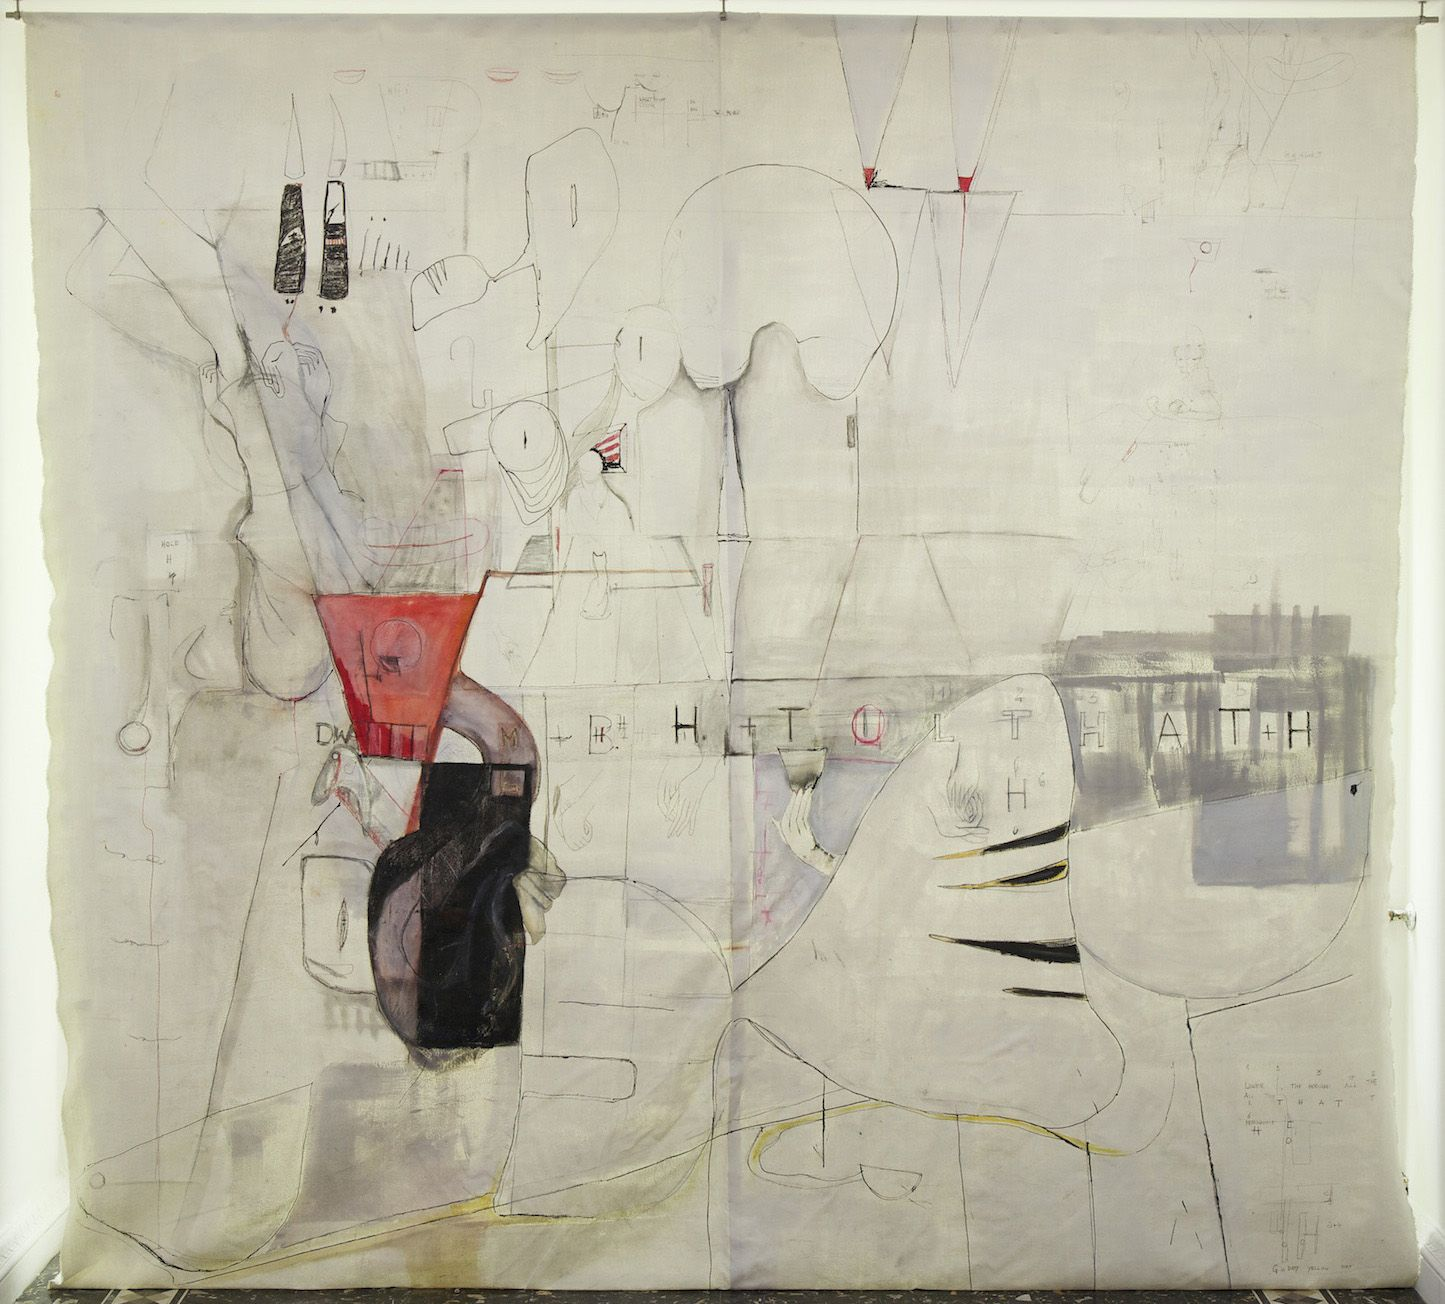 Anne Imhof Exhibitions Carre D Art Art Artwork Drawings